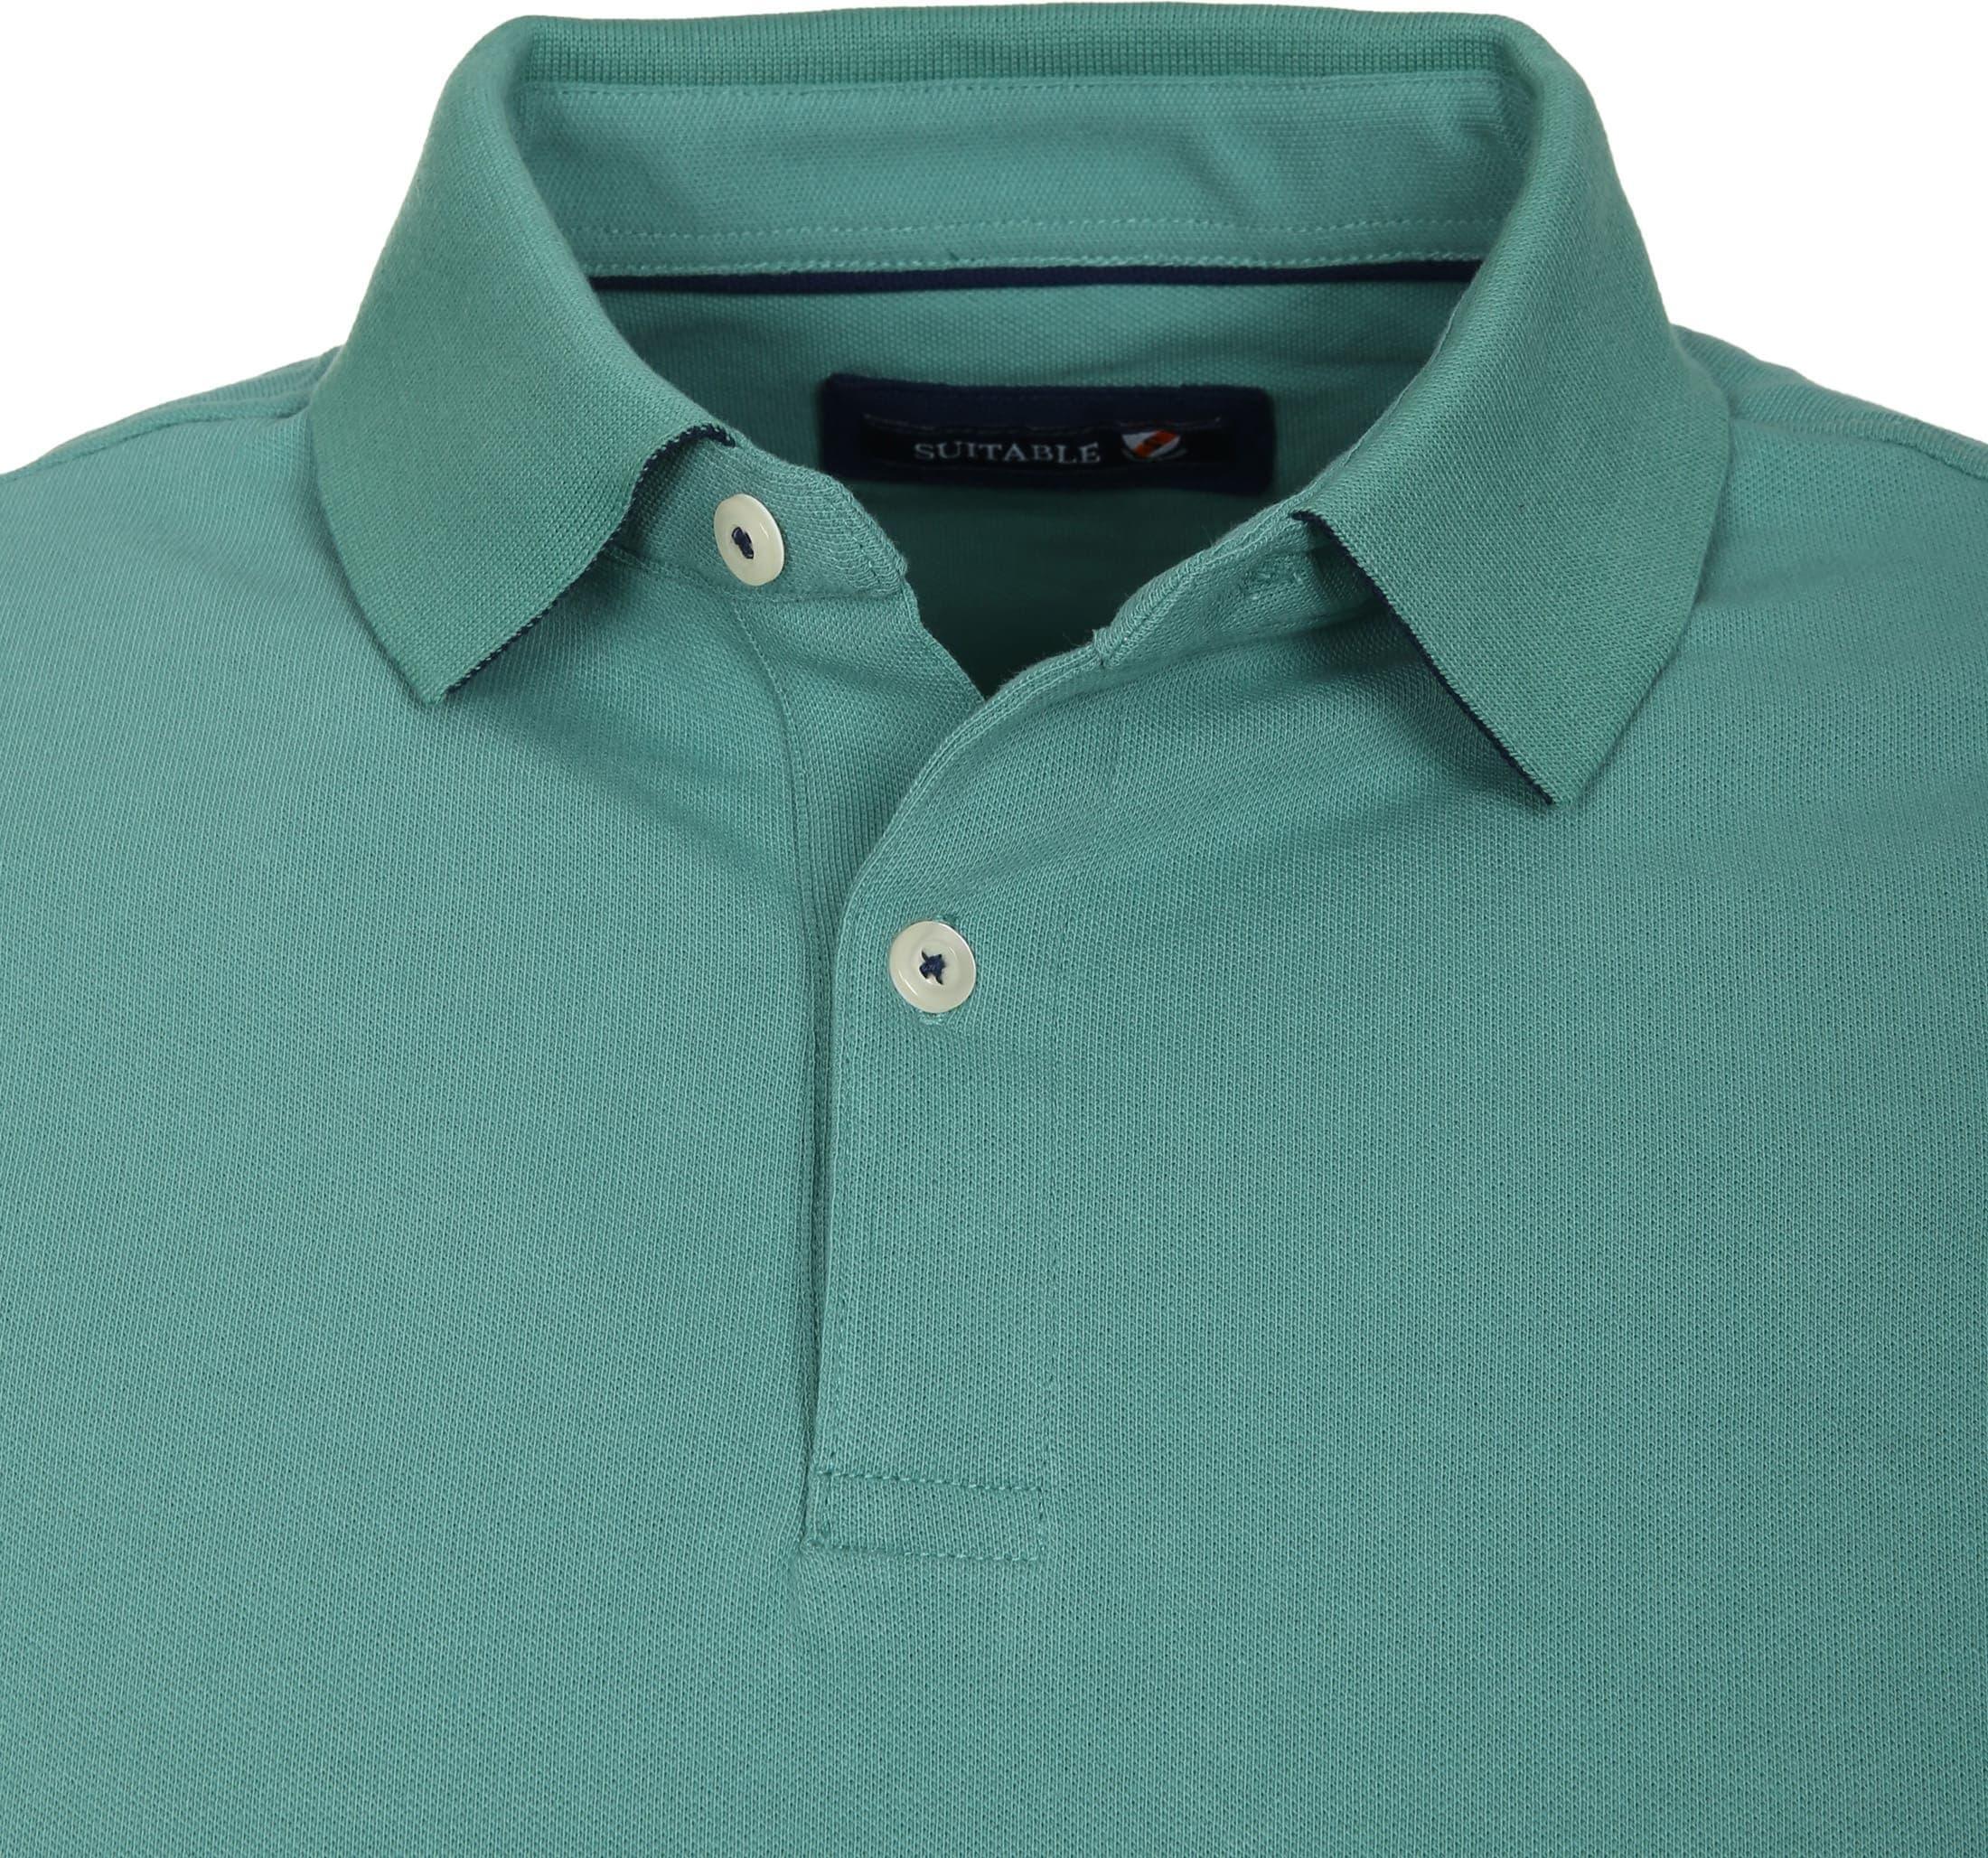 Suitable Poloshirt Basic Grün foto 1